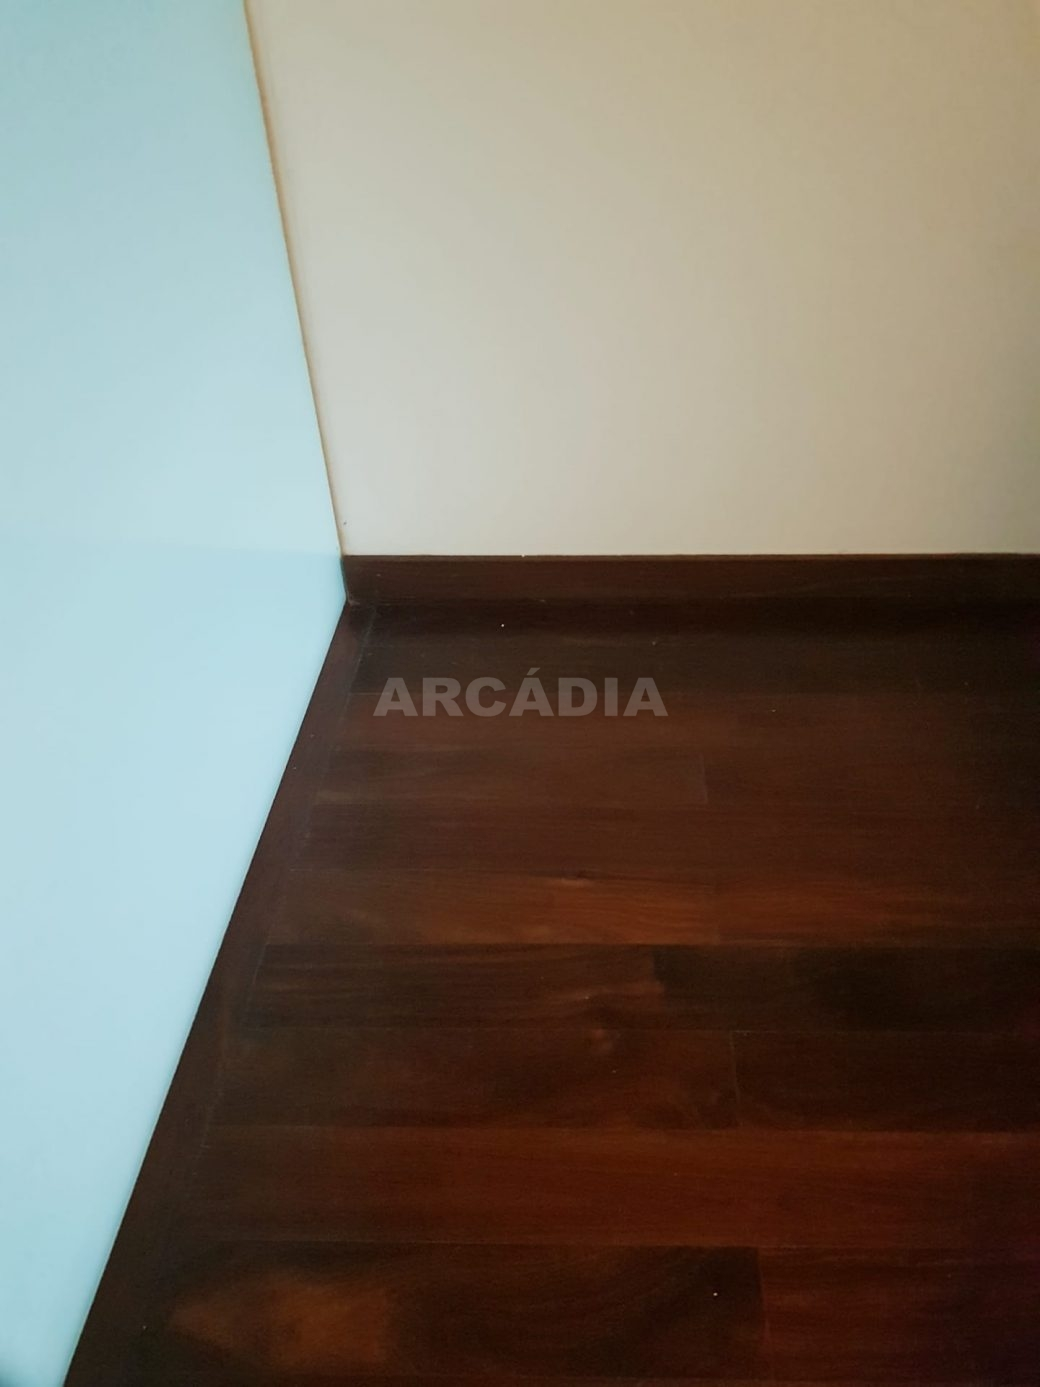 arcadia-imobiliaria-moradia-3665-525